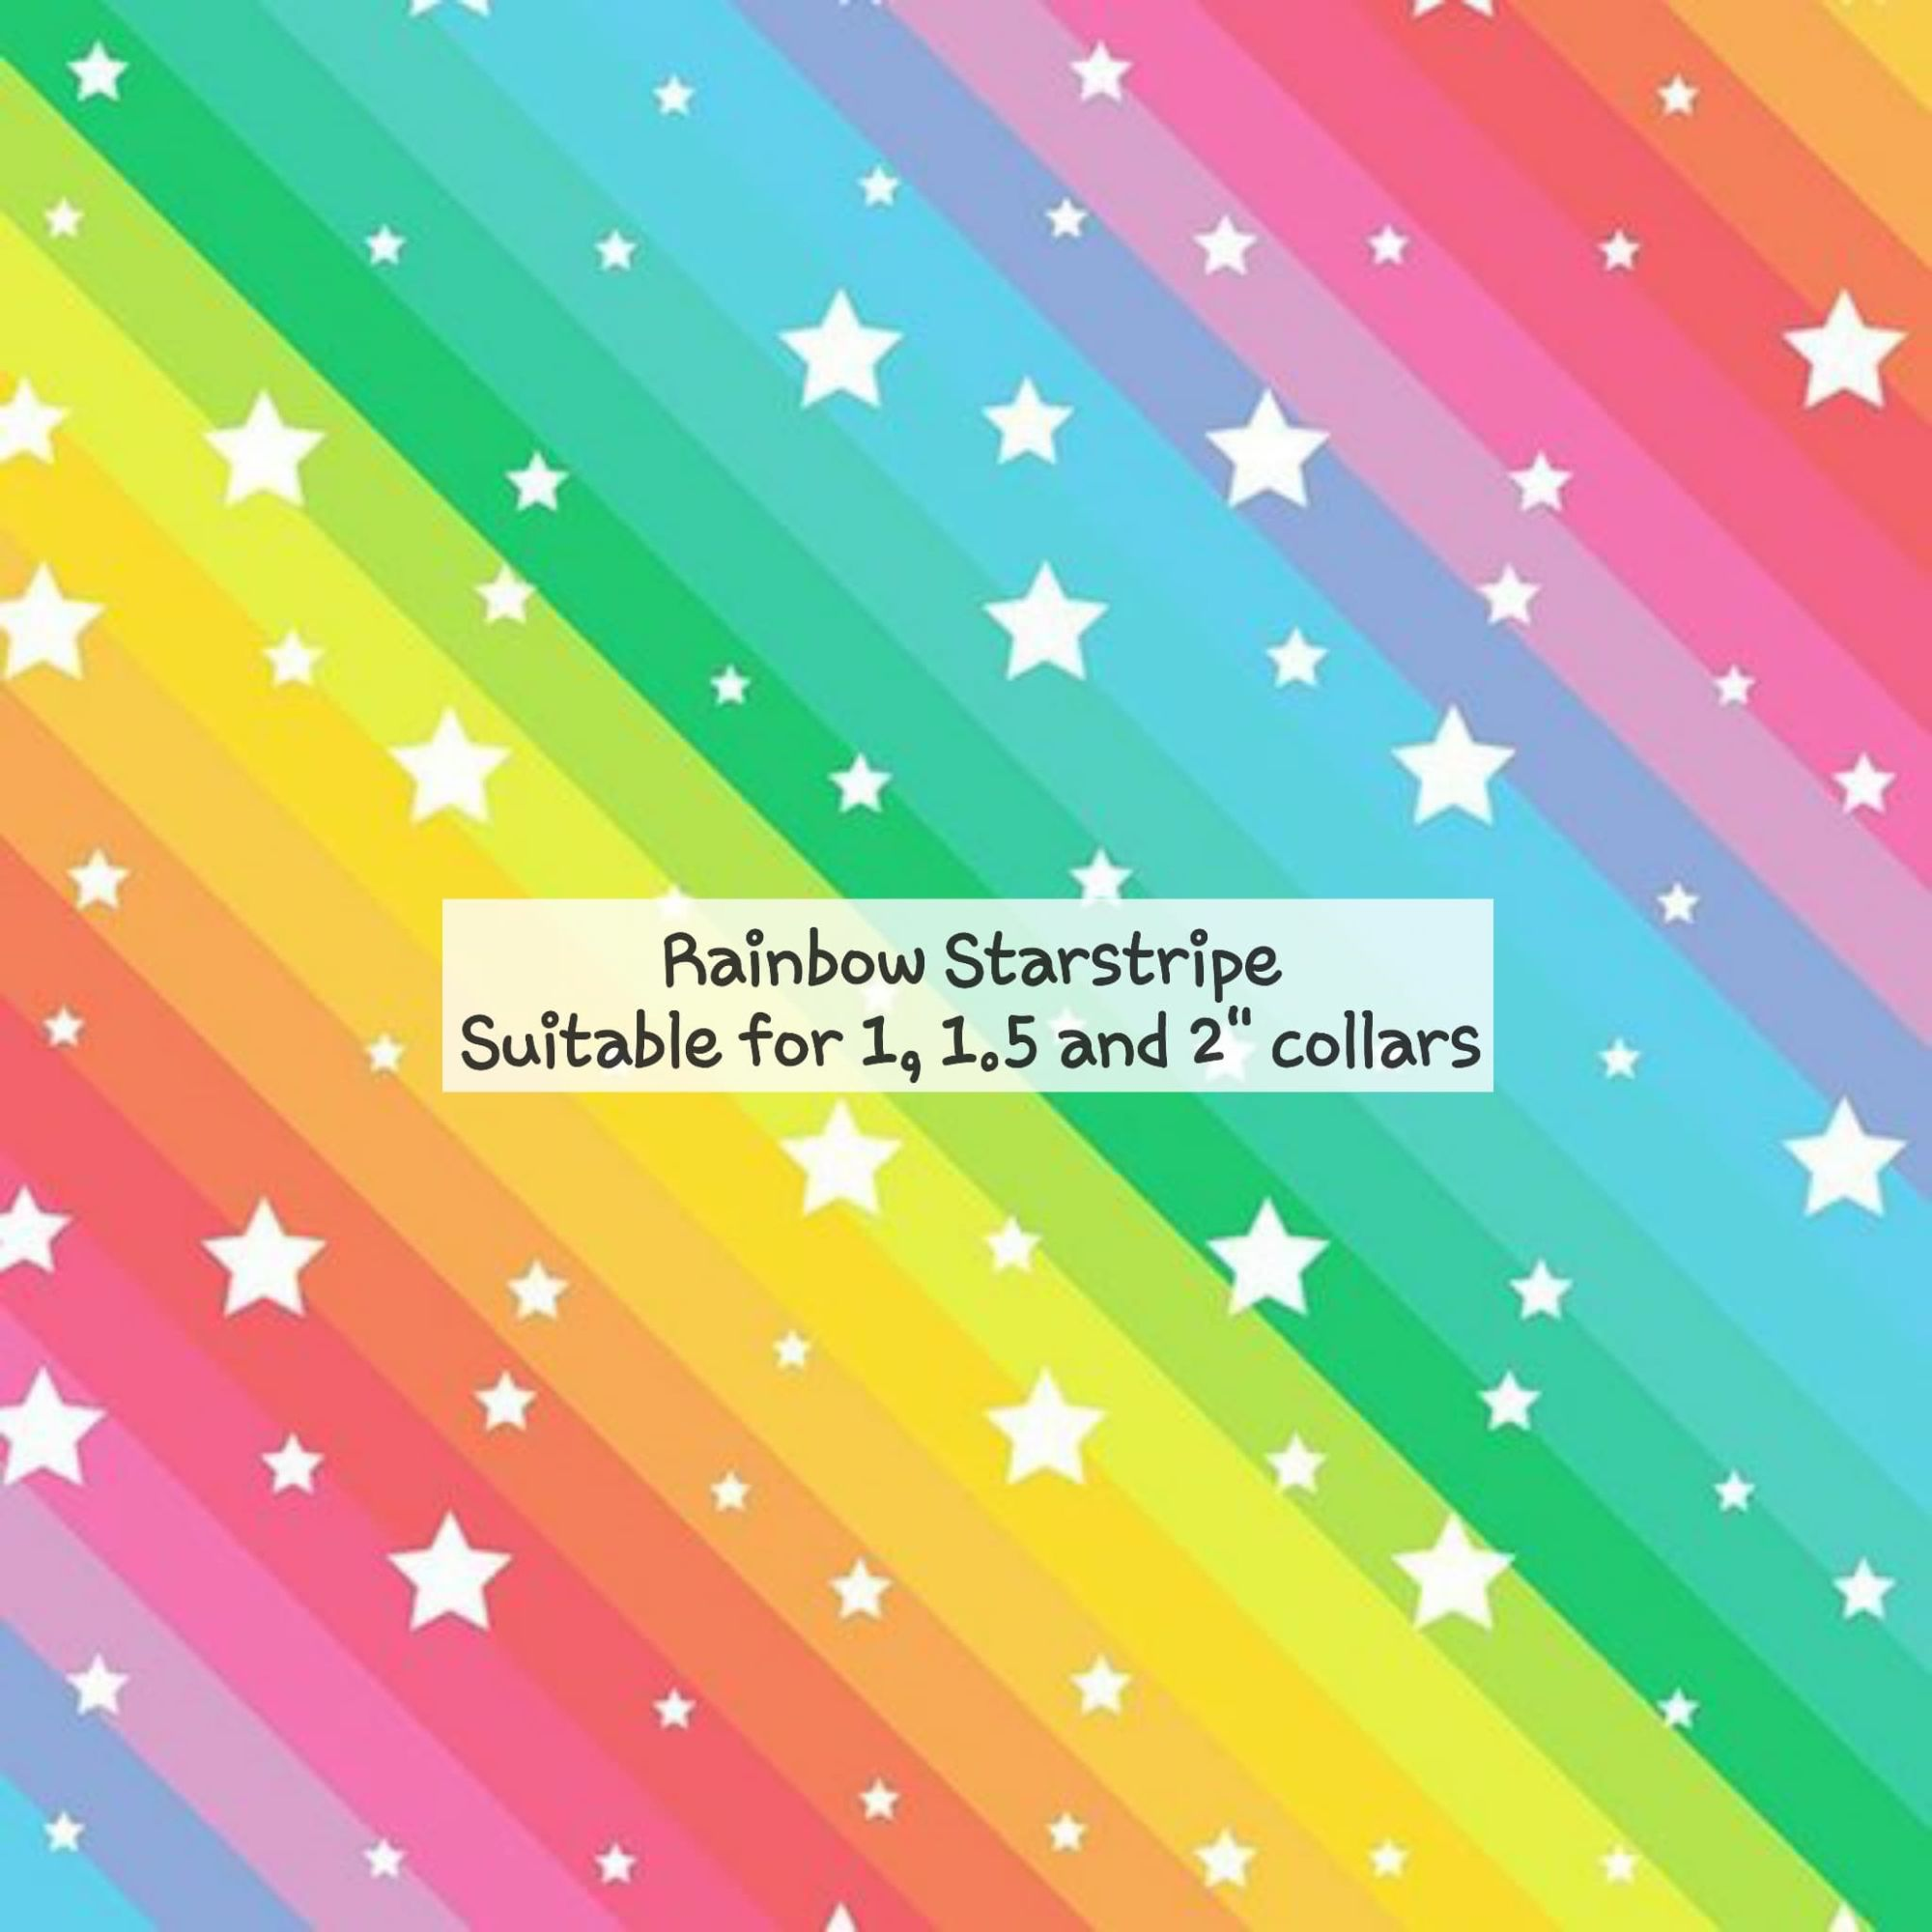 Rainbow Starstripe